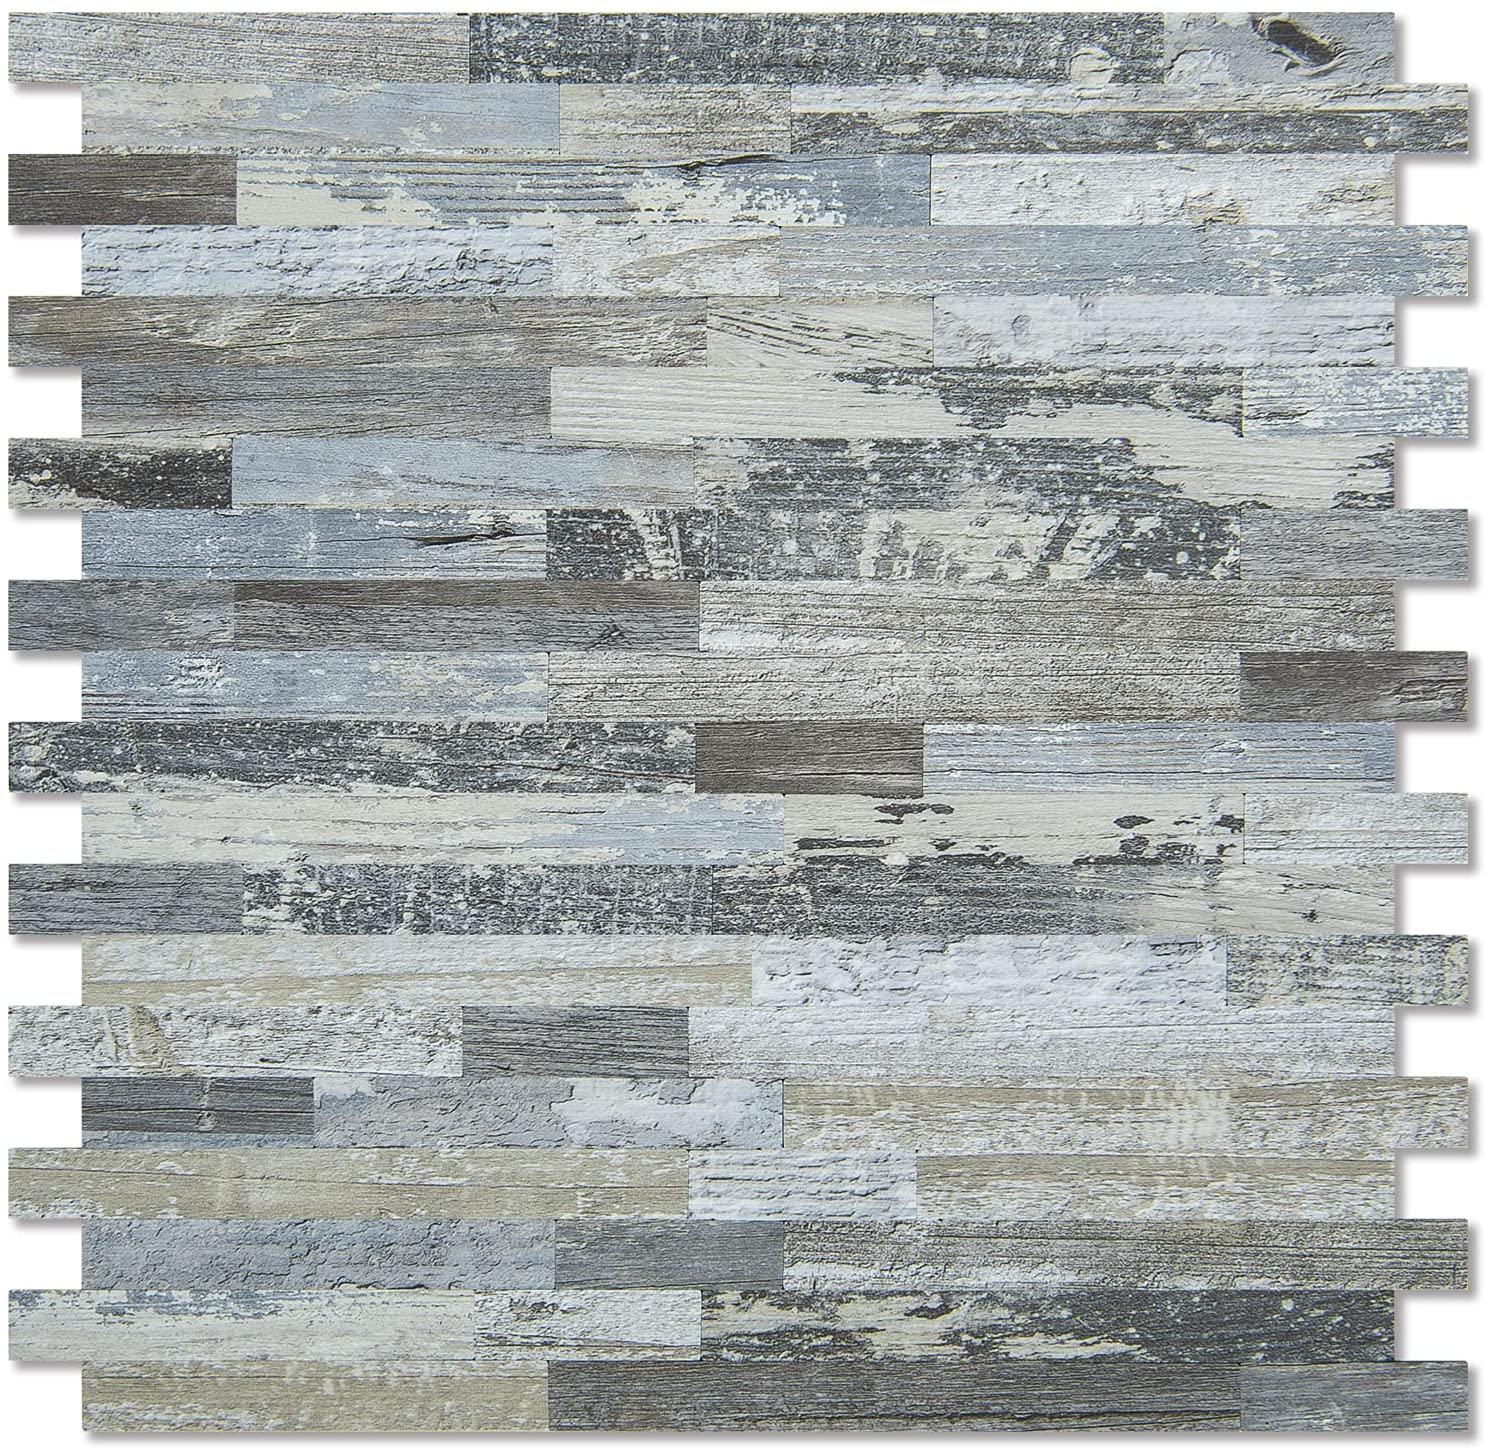 A16616-Art3d 10-Sheet Peel and Stick Stone Backsplash Tile for Kitchen, Bathroom - Volakas White Embellished with Metal Silver